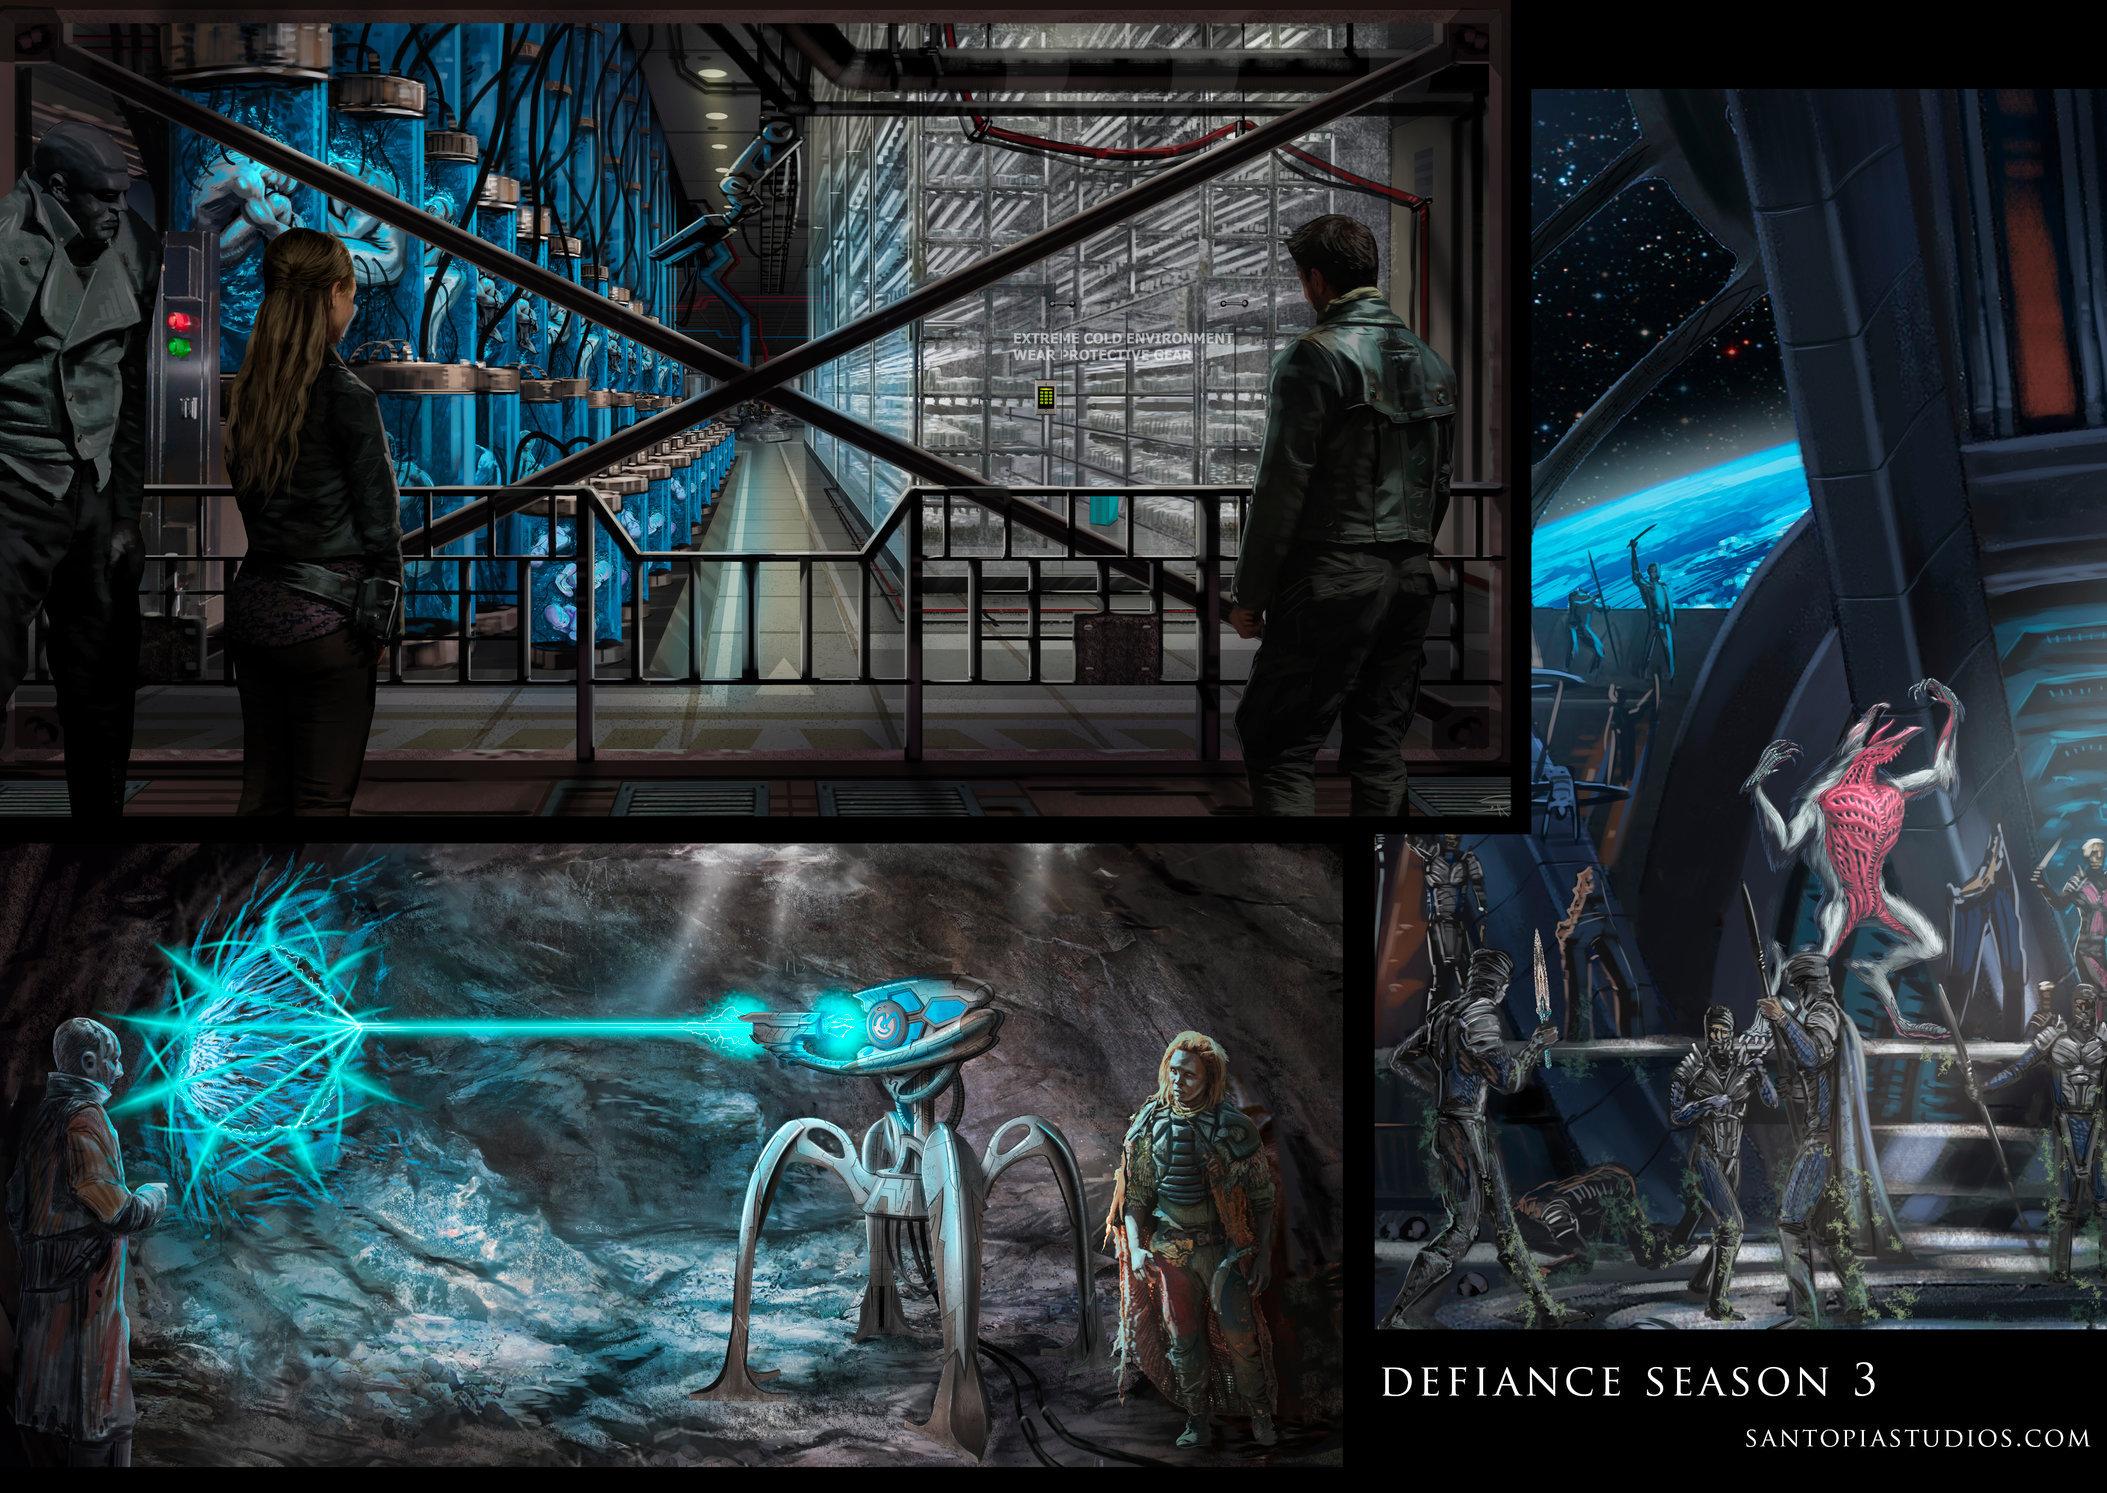 ss-defiance-titleshot01 copy.jpg